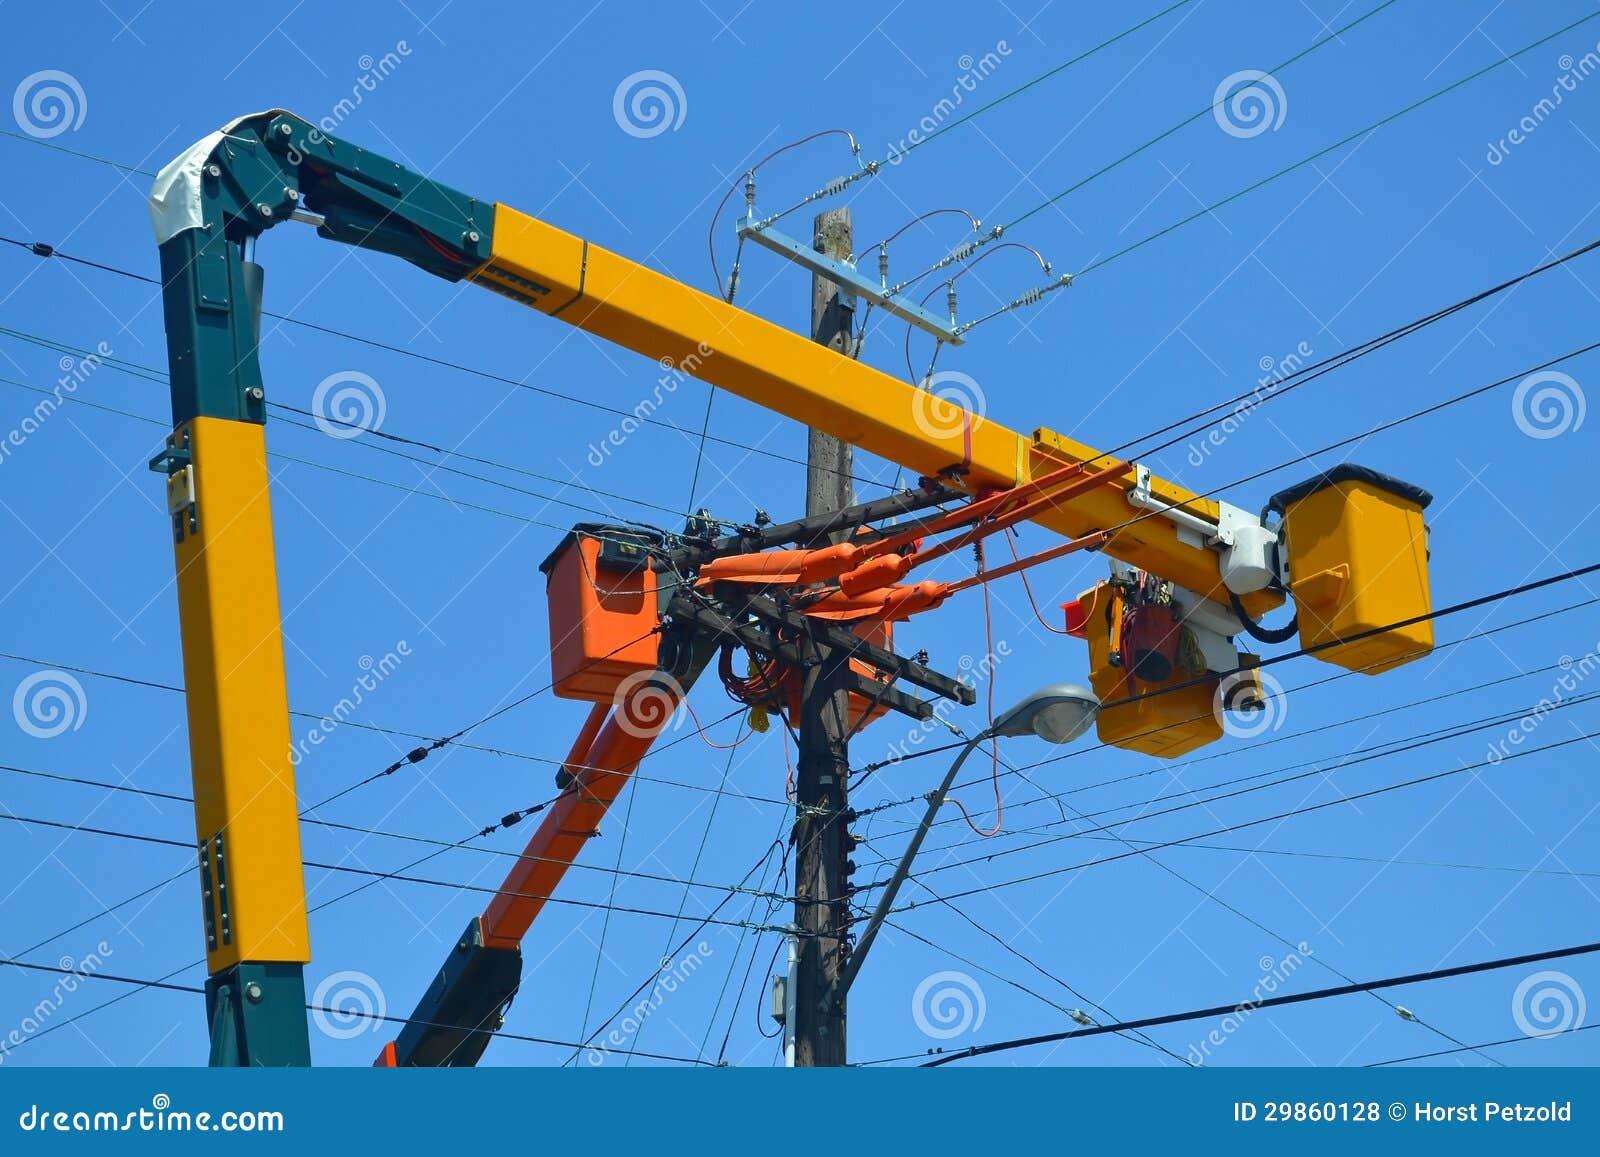 lift trucks on power lines  royalty free stock photos